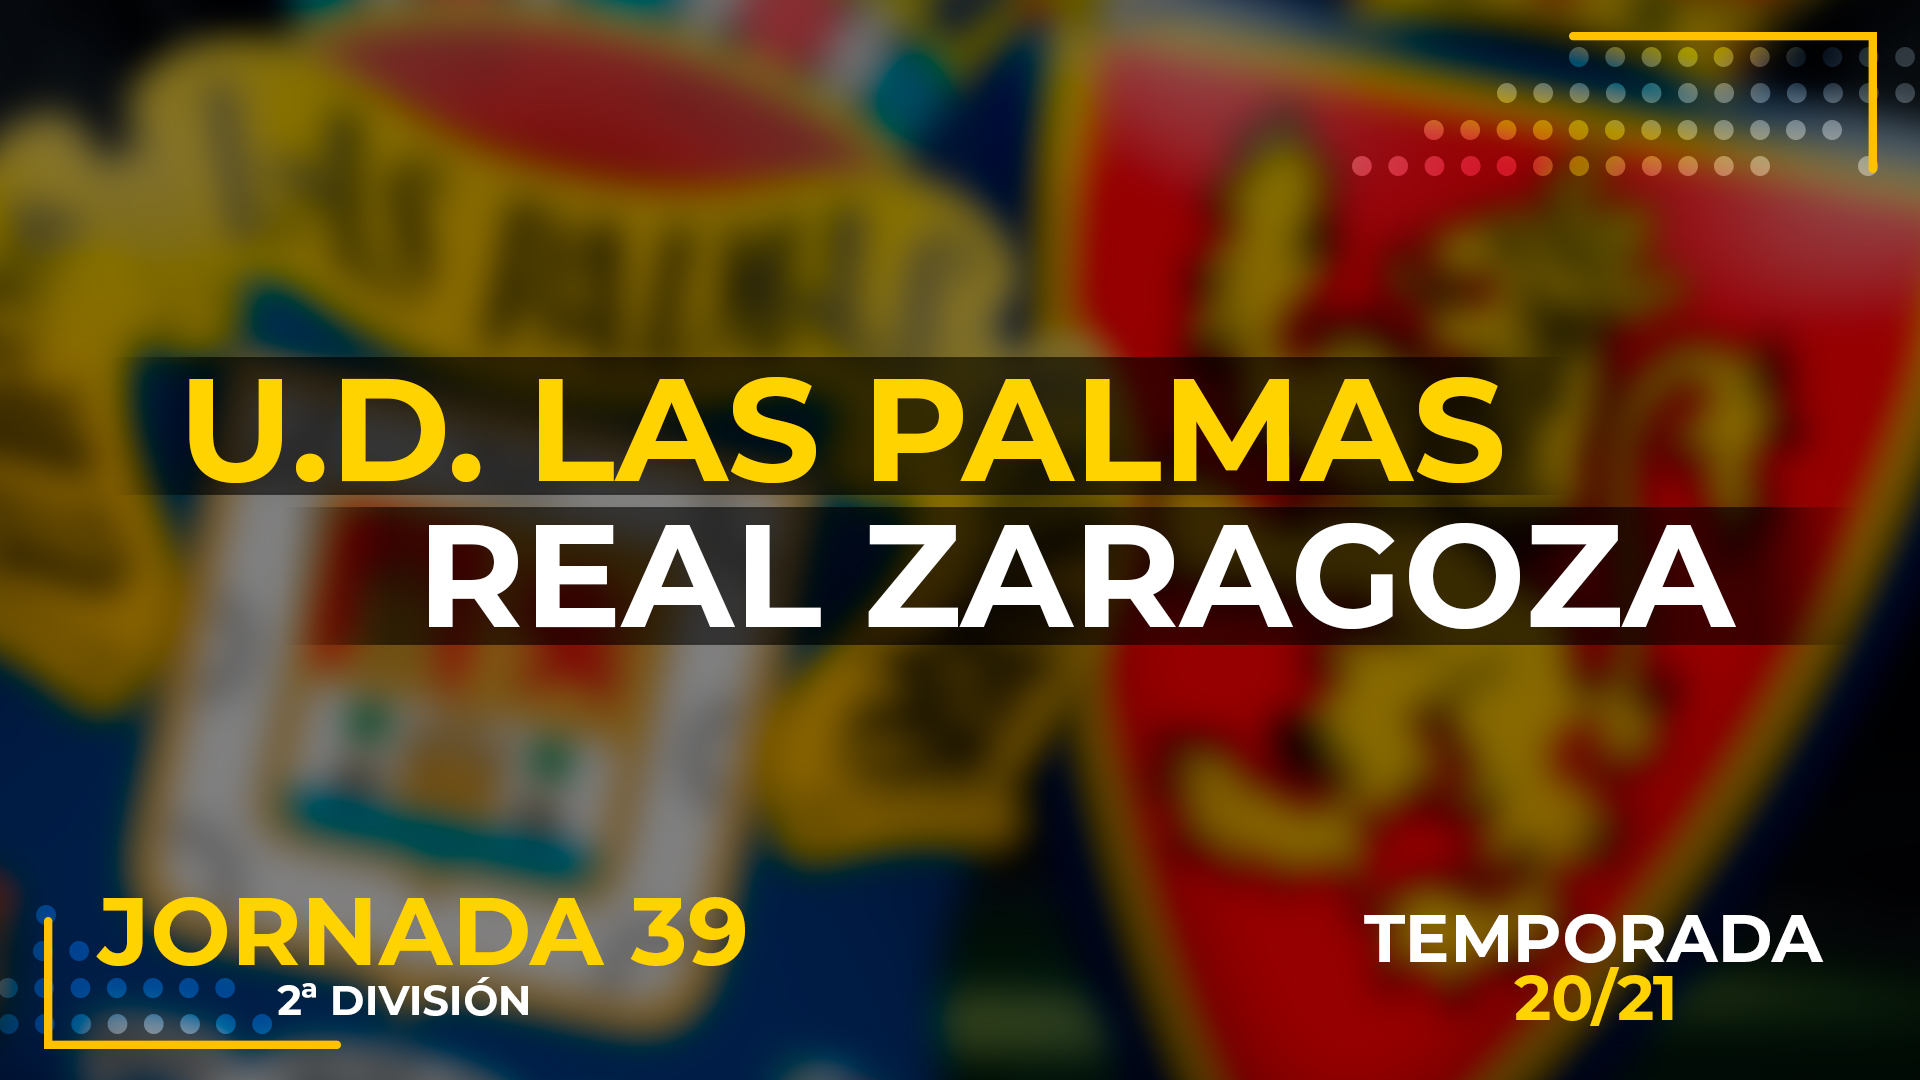 UD Las Palmas vs Real Zaragoza